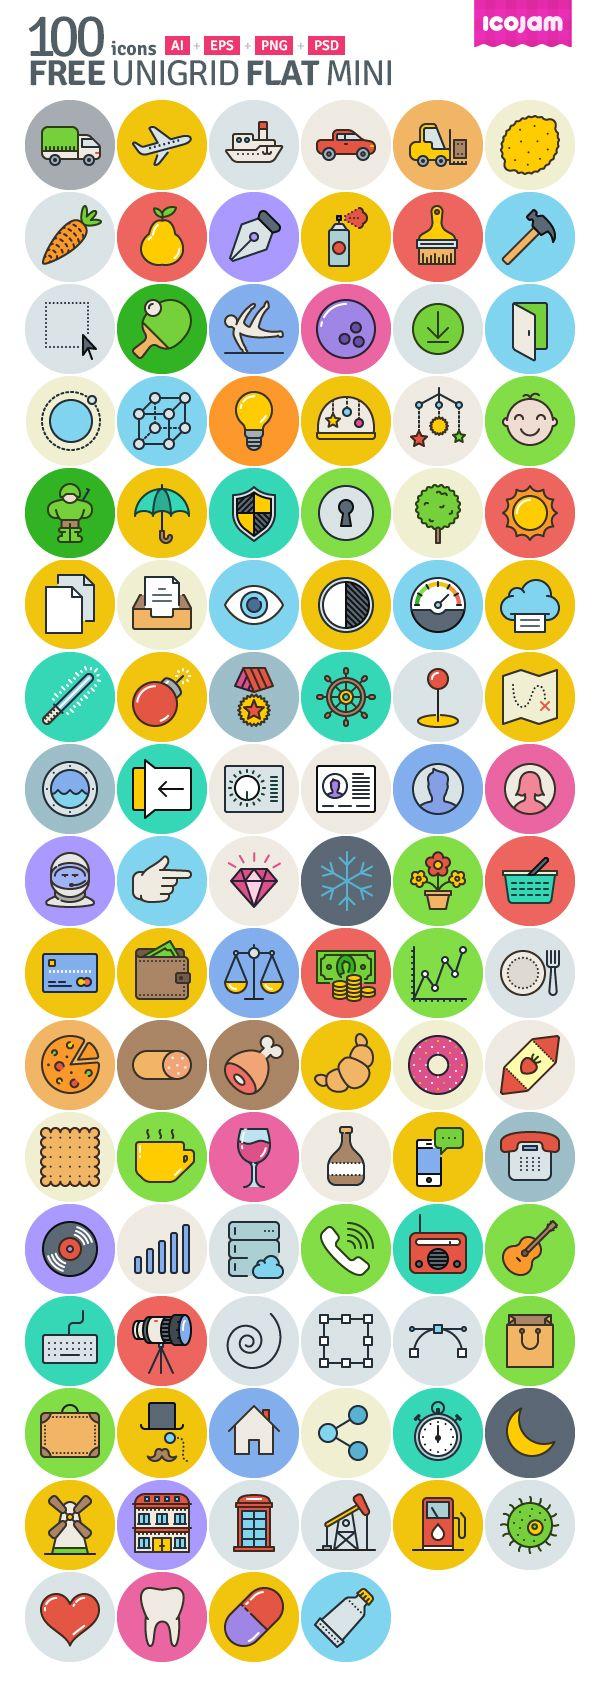 Unigrid Flat: 100 Free Icons #freeicons #freepsdicons #lineicons #flaticons #vectoricons